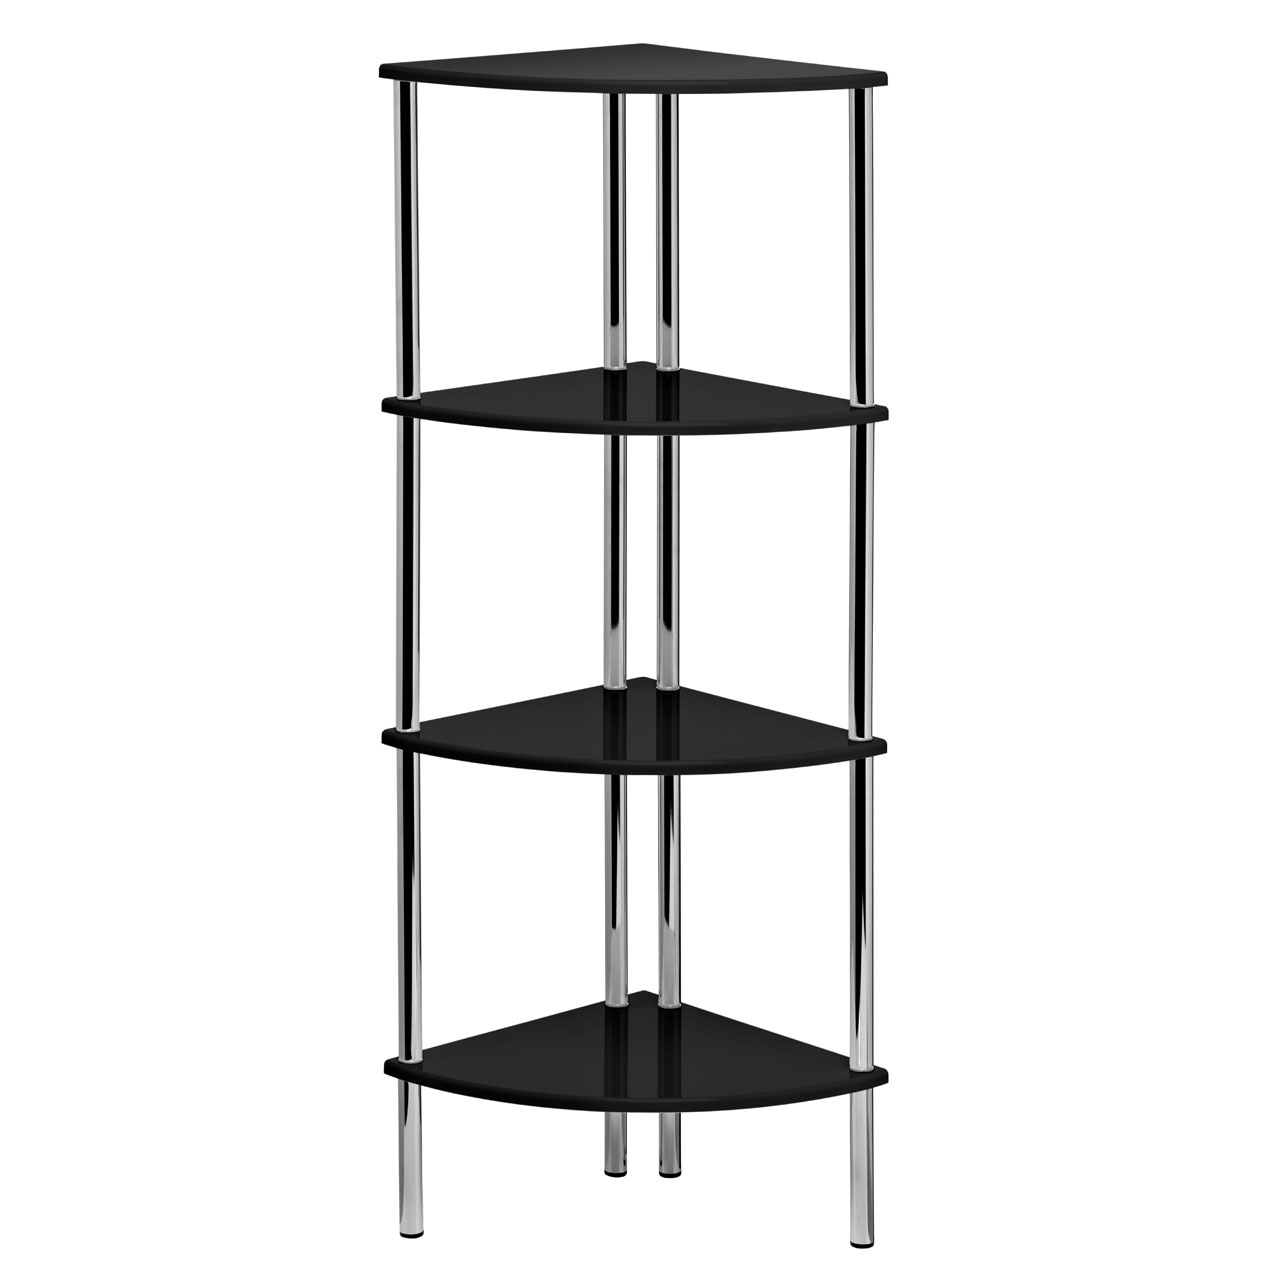 Details About Corner Shelf Unit 4 Tier Black High Gloss Chrome Finish Storage Organizer Rack